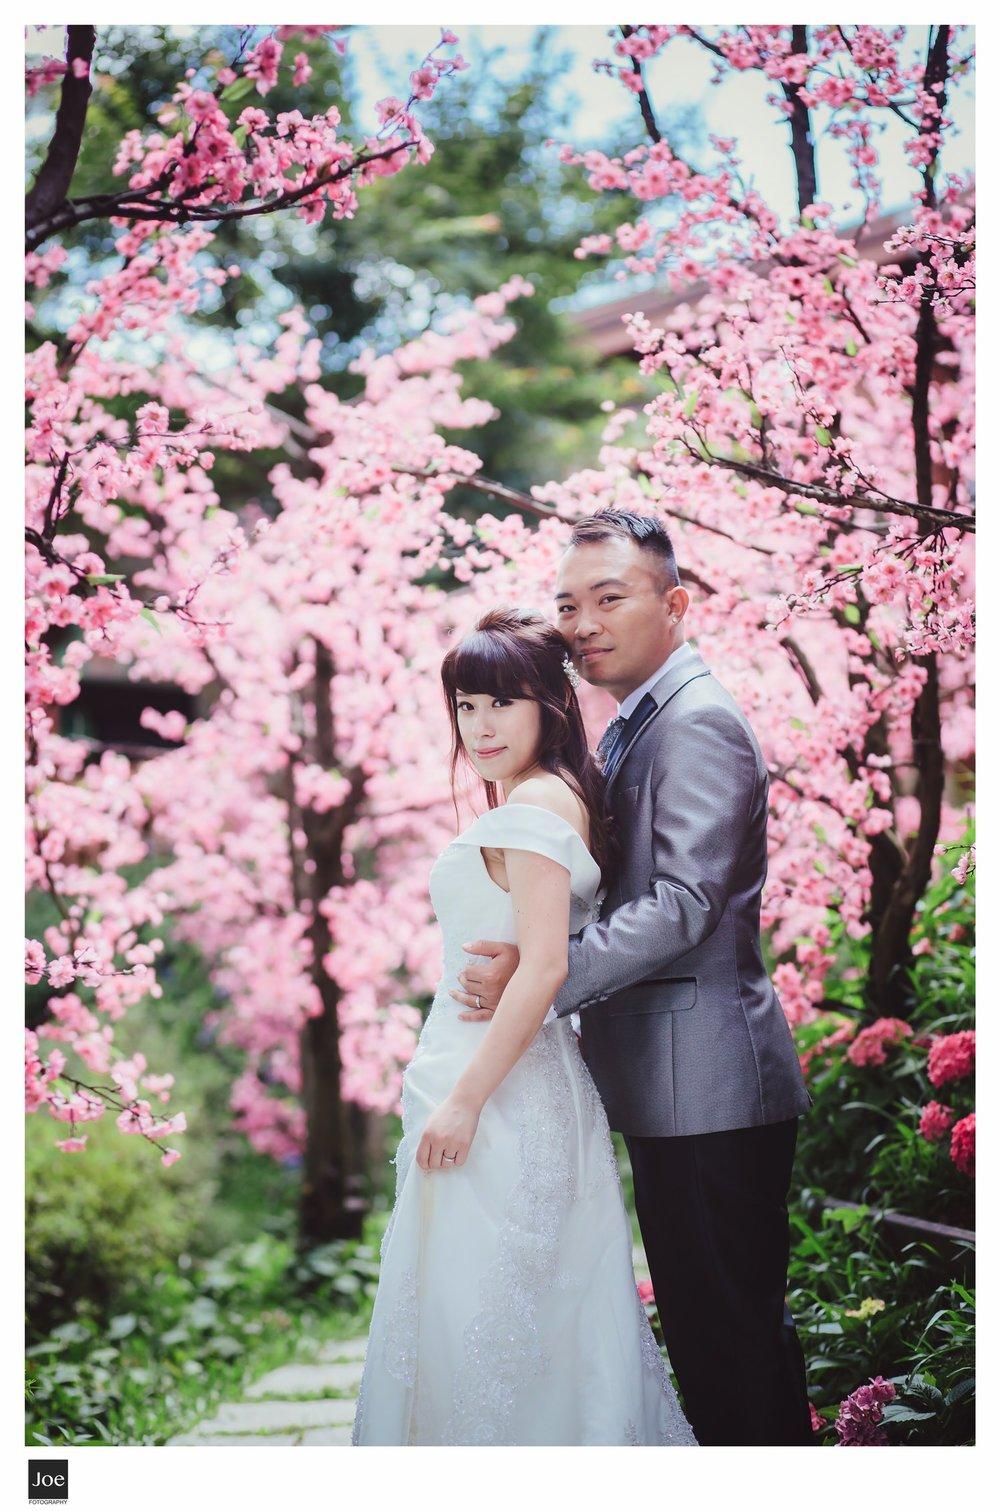 taiwan-pre-wedding-roger-wing-joe-fotography-009.jpg